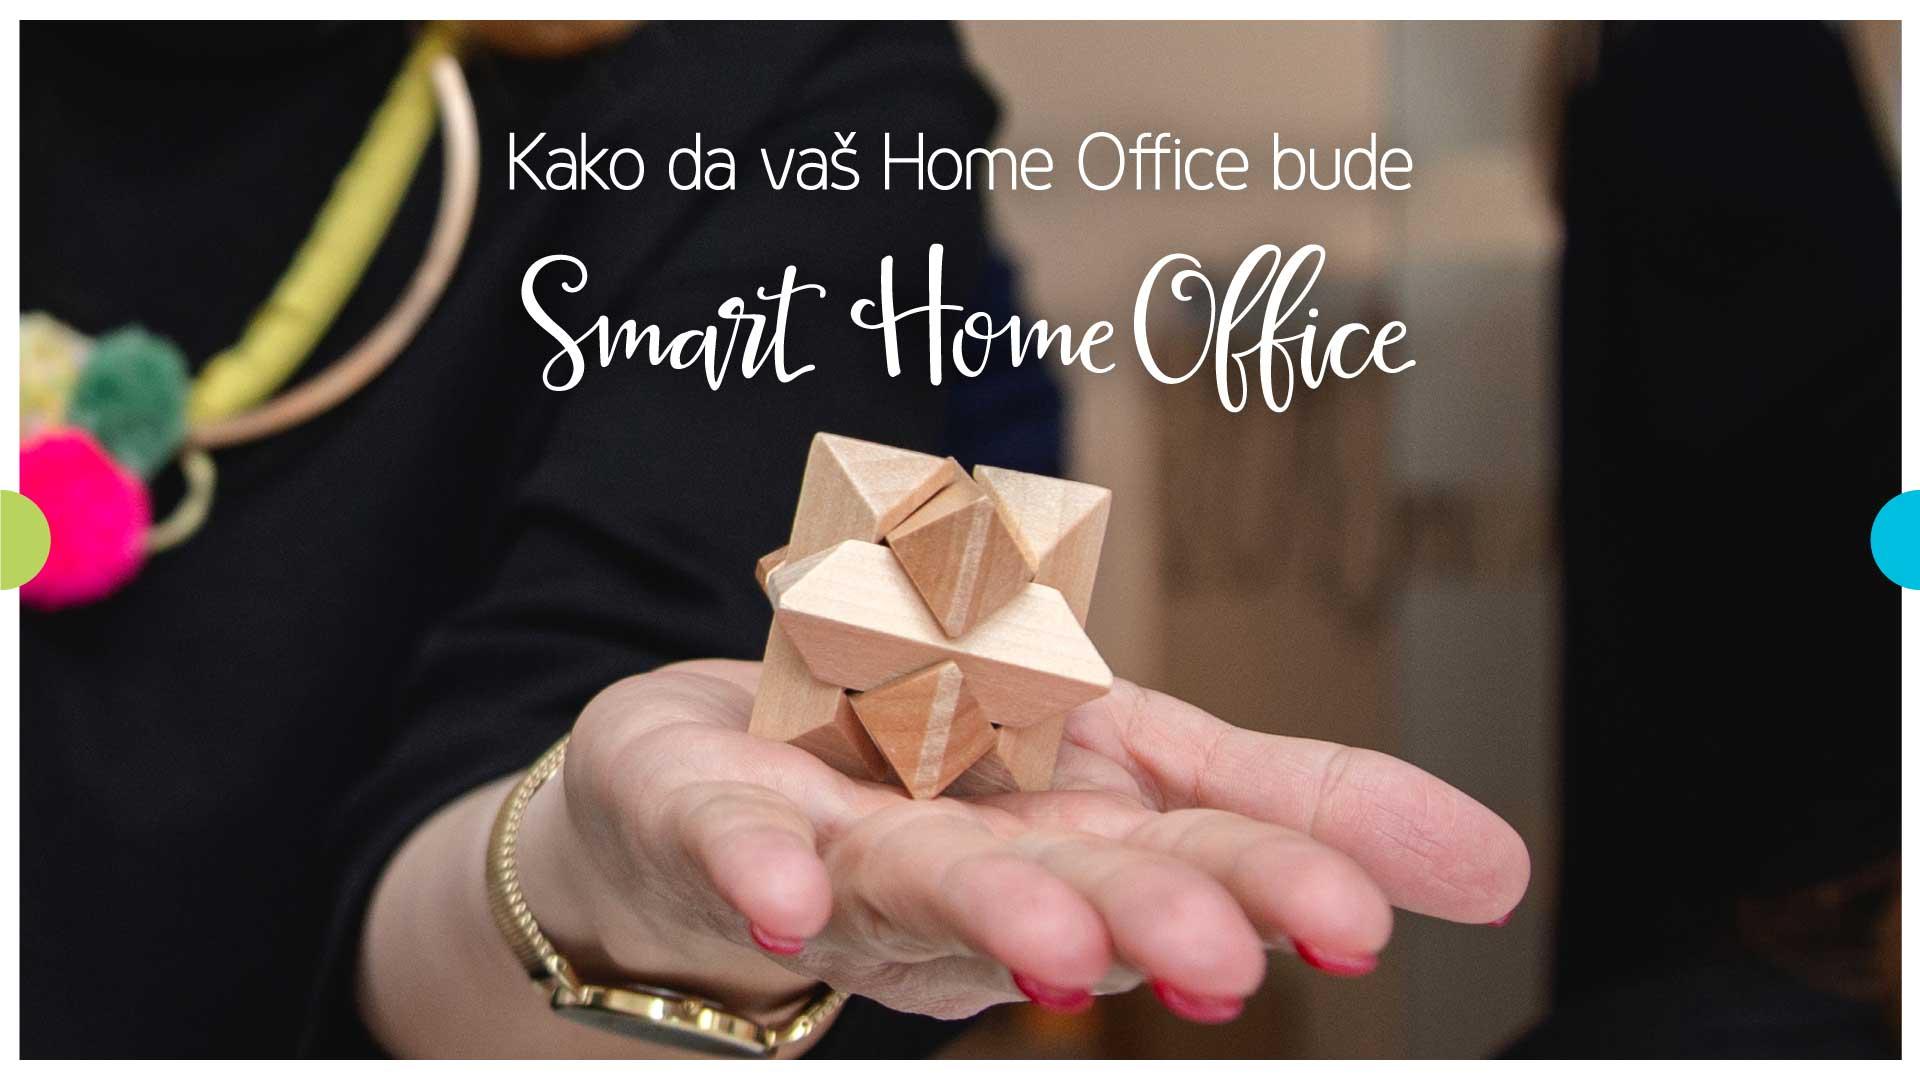 Smart Vision - Kako Da Vaš Home Office Bude Smart Home Office